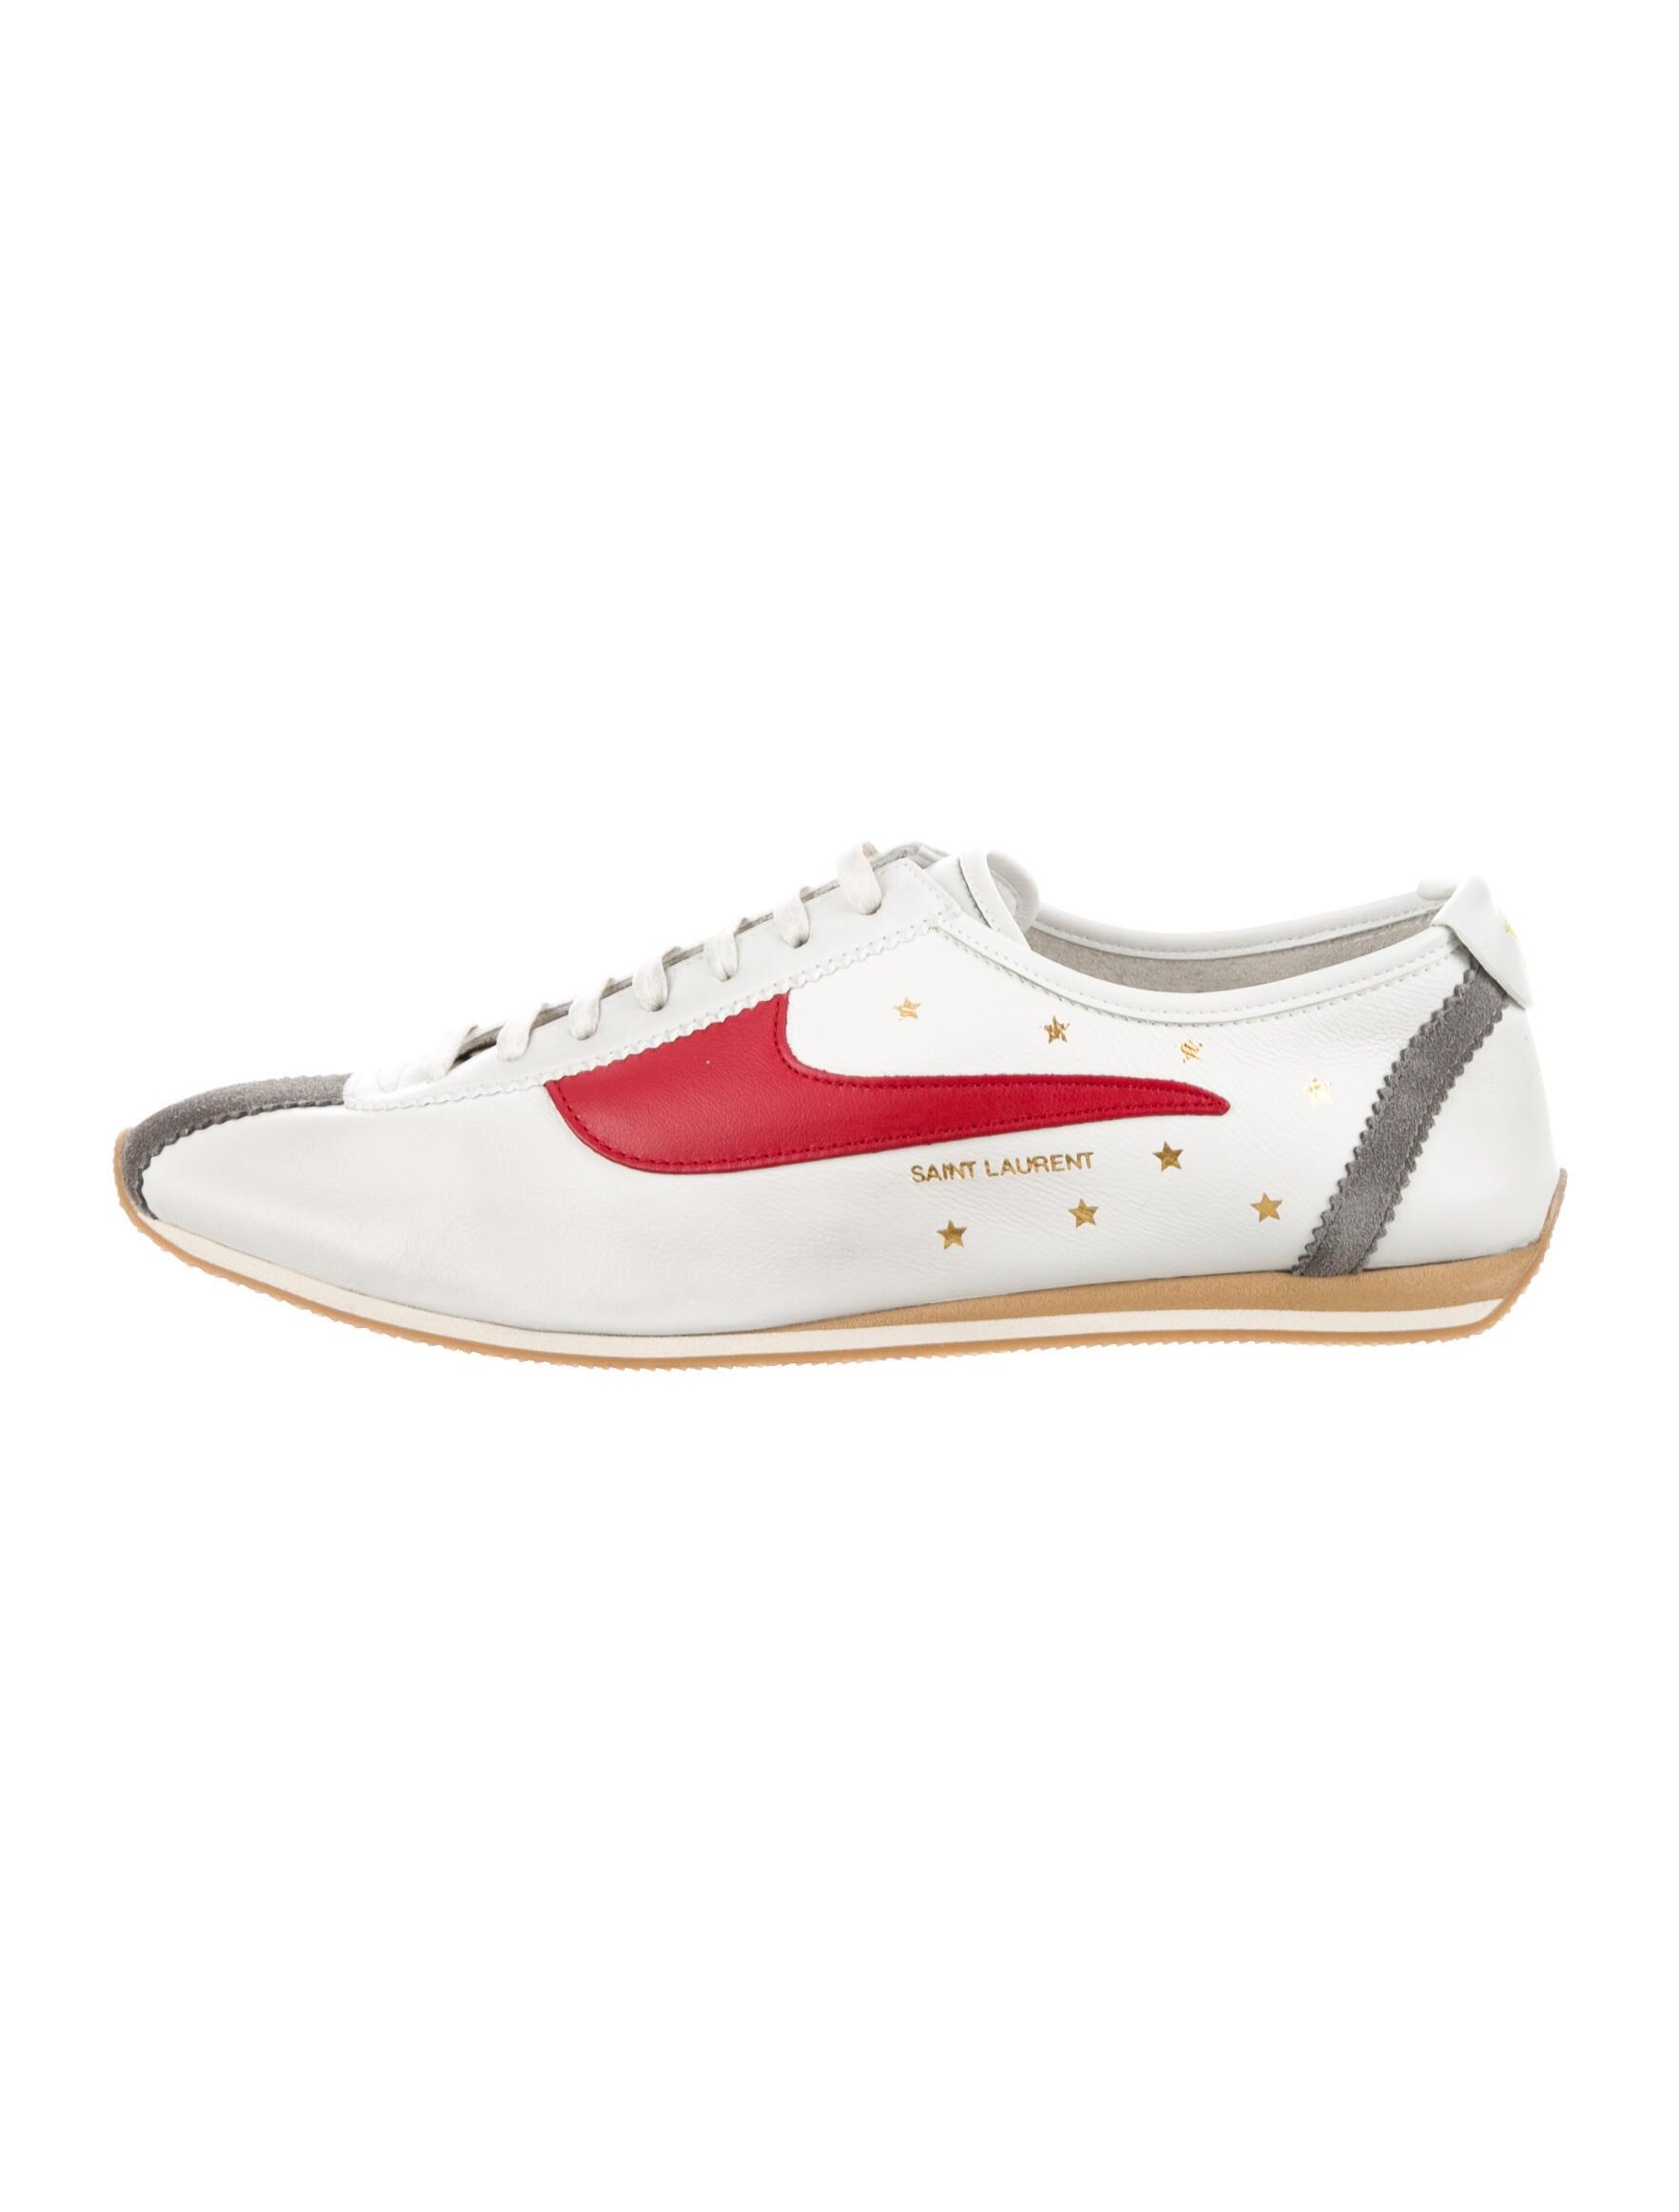 Saint Laurent Jay 05 Sneakers w/ Tags